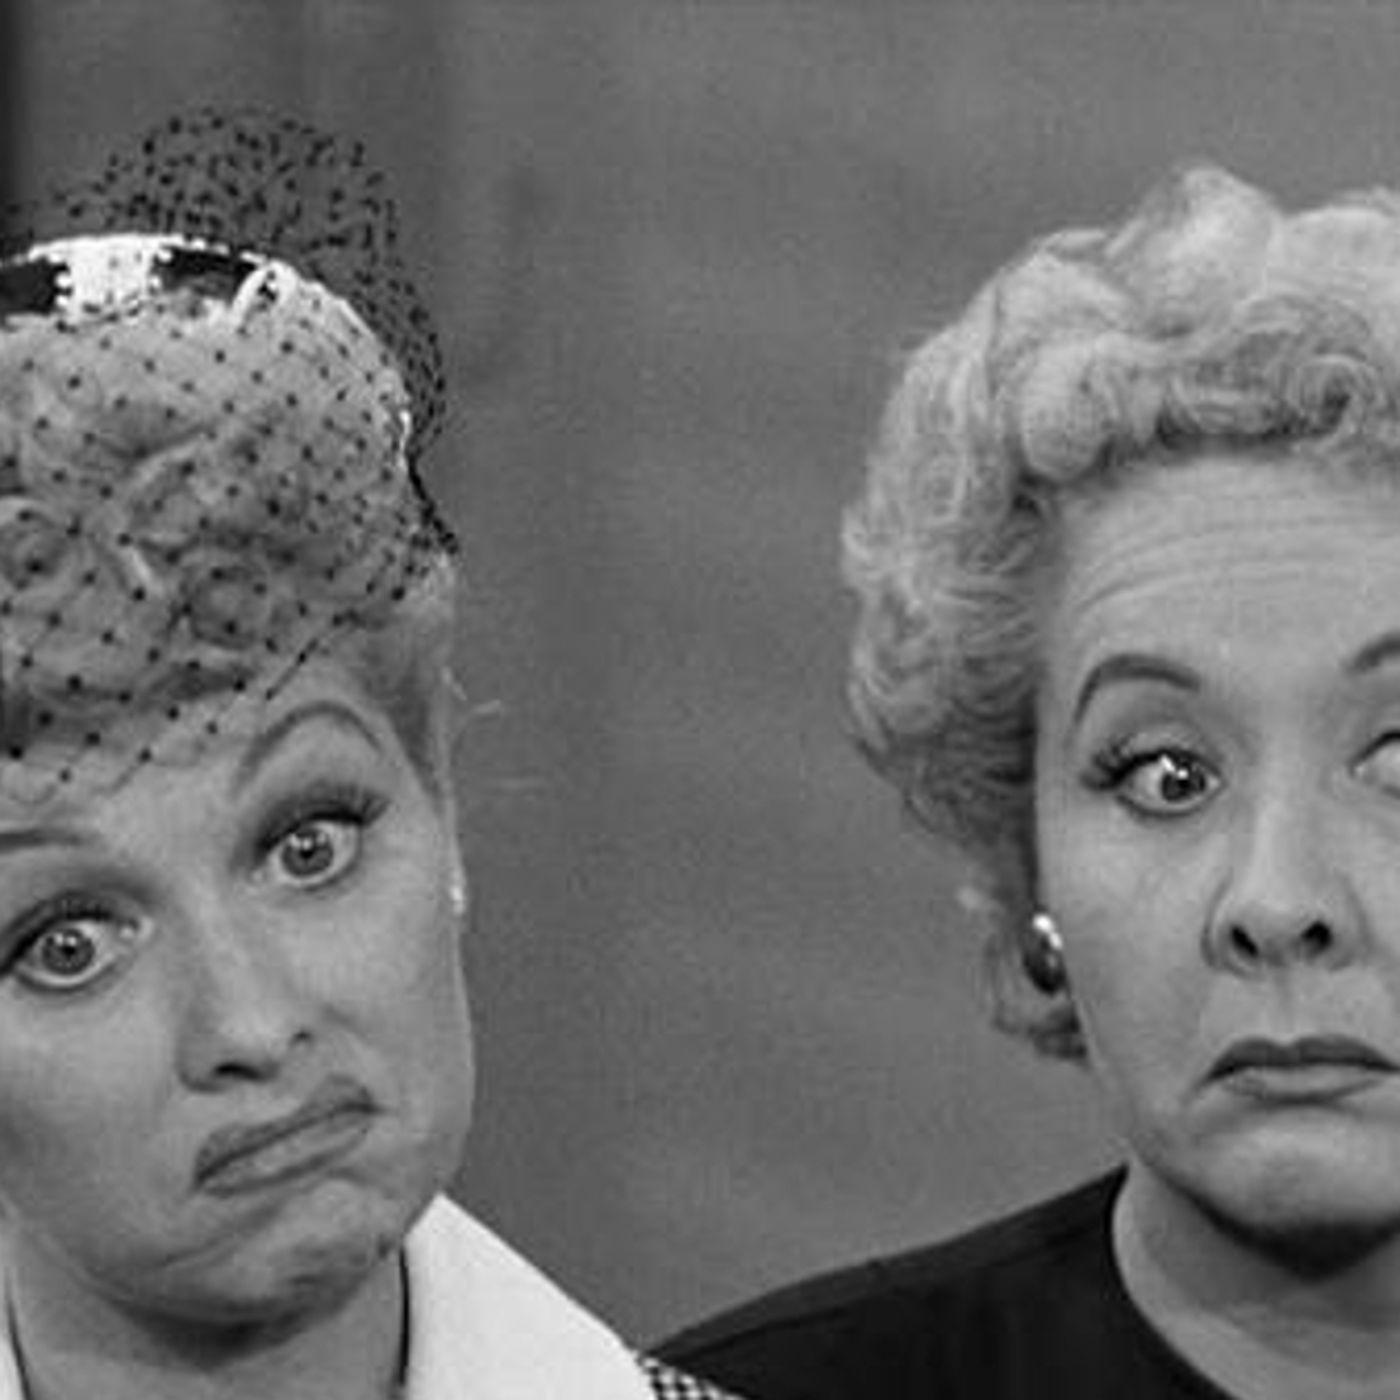 Lottie Johnson Why I Love Lucille Ball My 5 Favorite Scenes